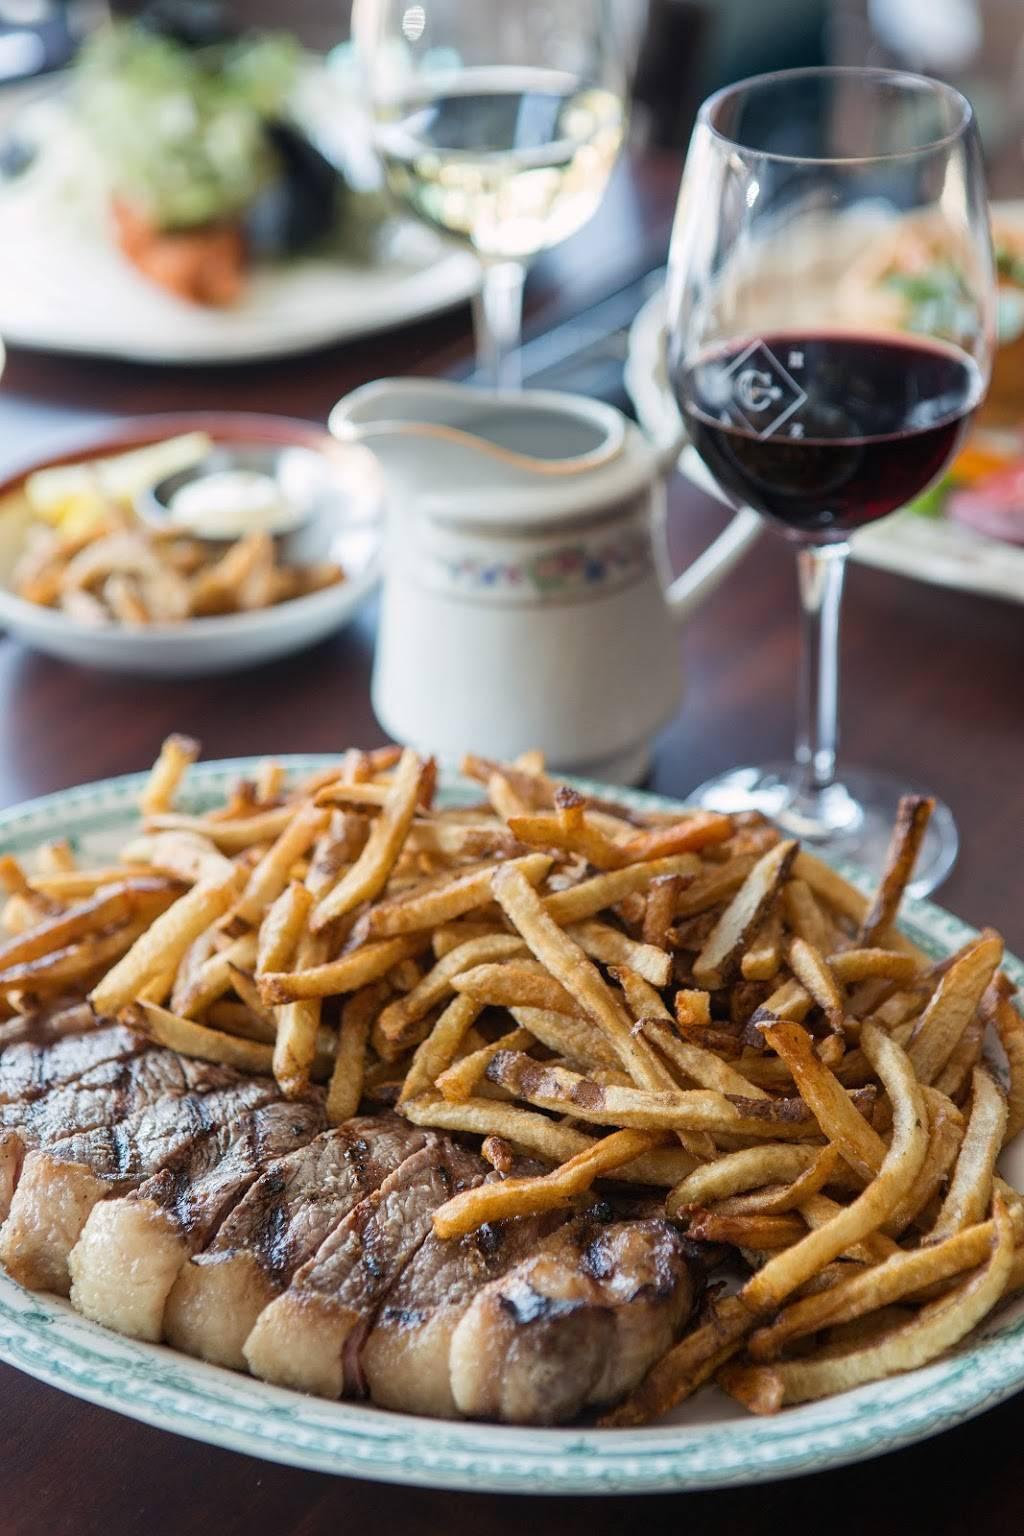 CHAZ | restaurant | 1326 Avenue Maguire, Québec, QC G1T 1Z3, Canada | 4186828888 OR +1 418-682-8888